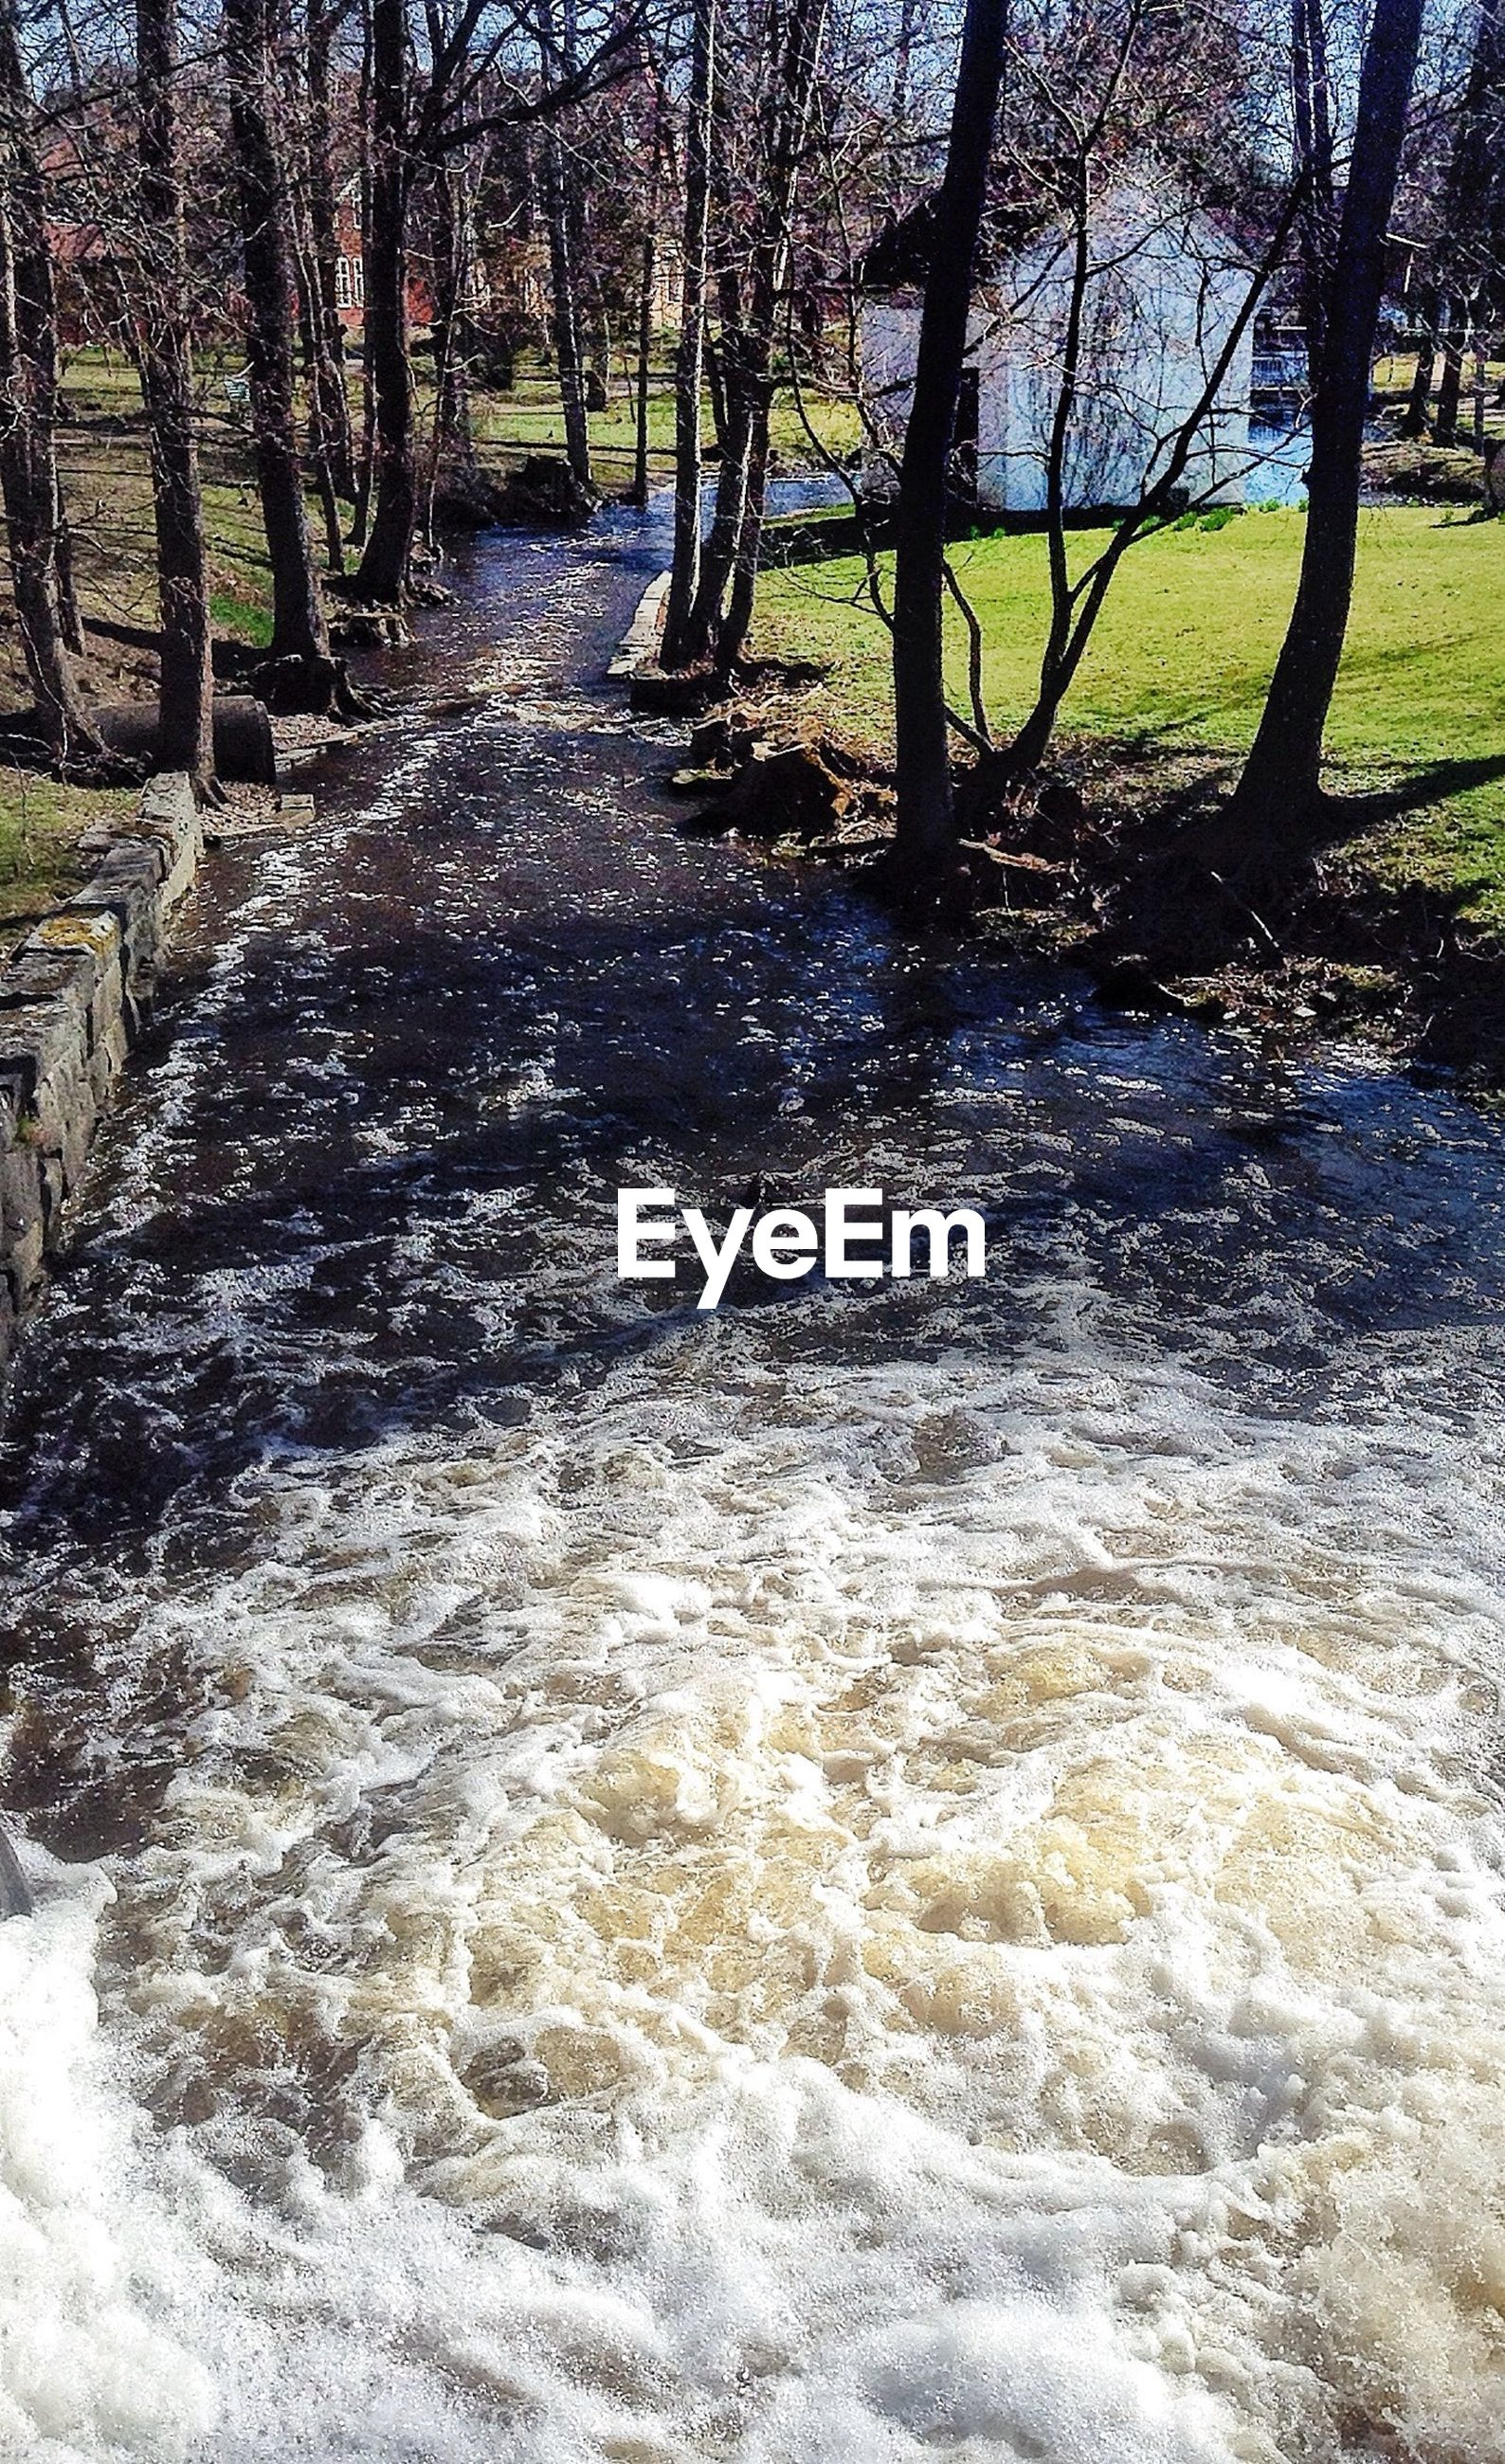 Stream flowing through trees